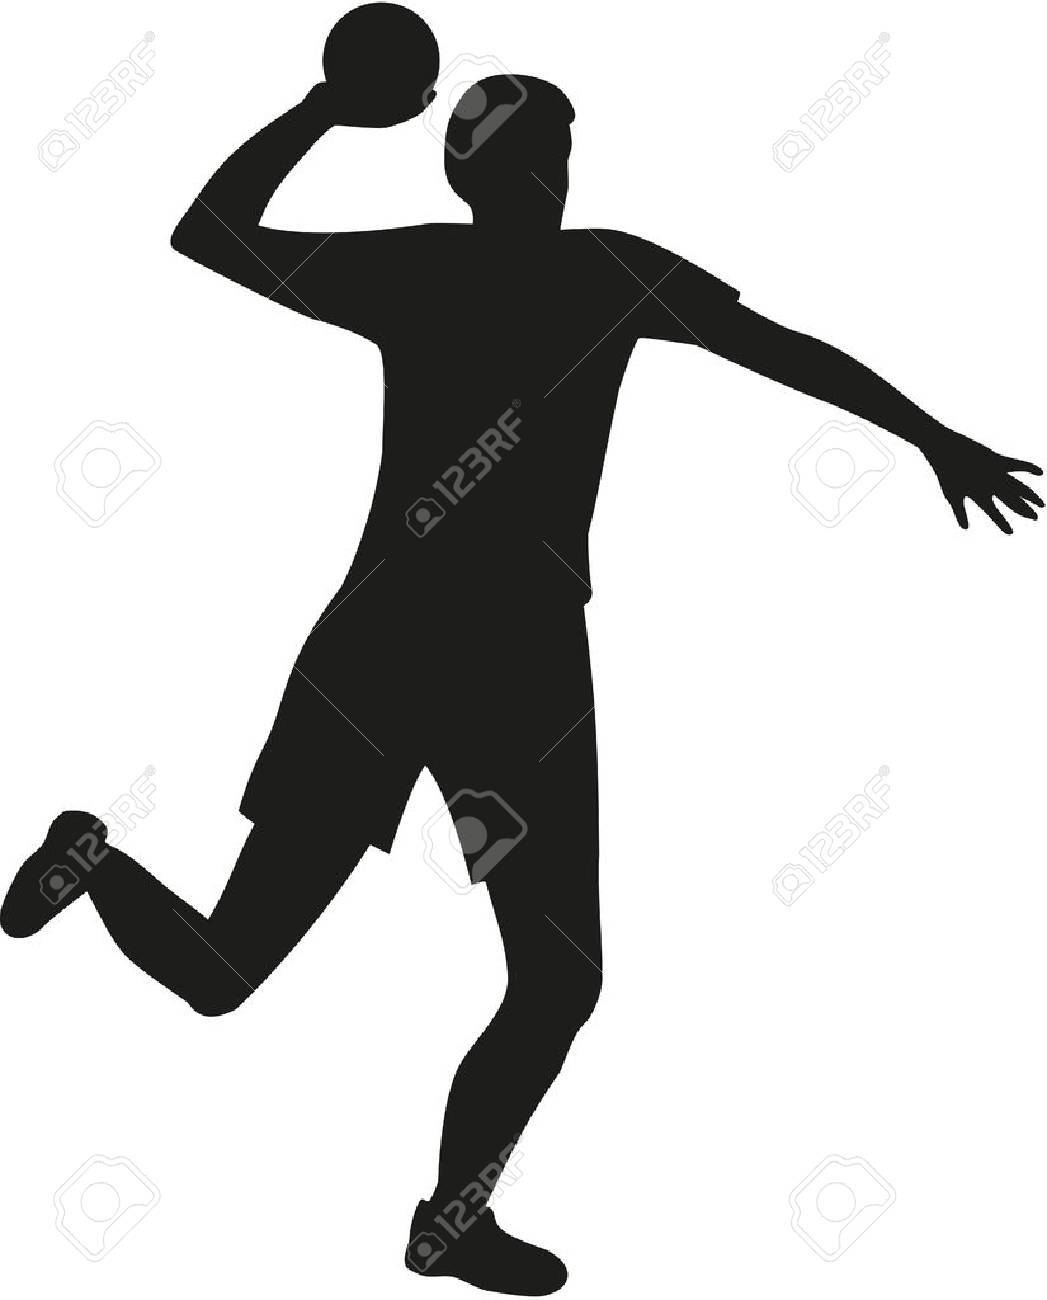 Dodgeball player throwing a ball - 49616276